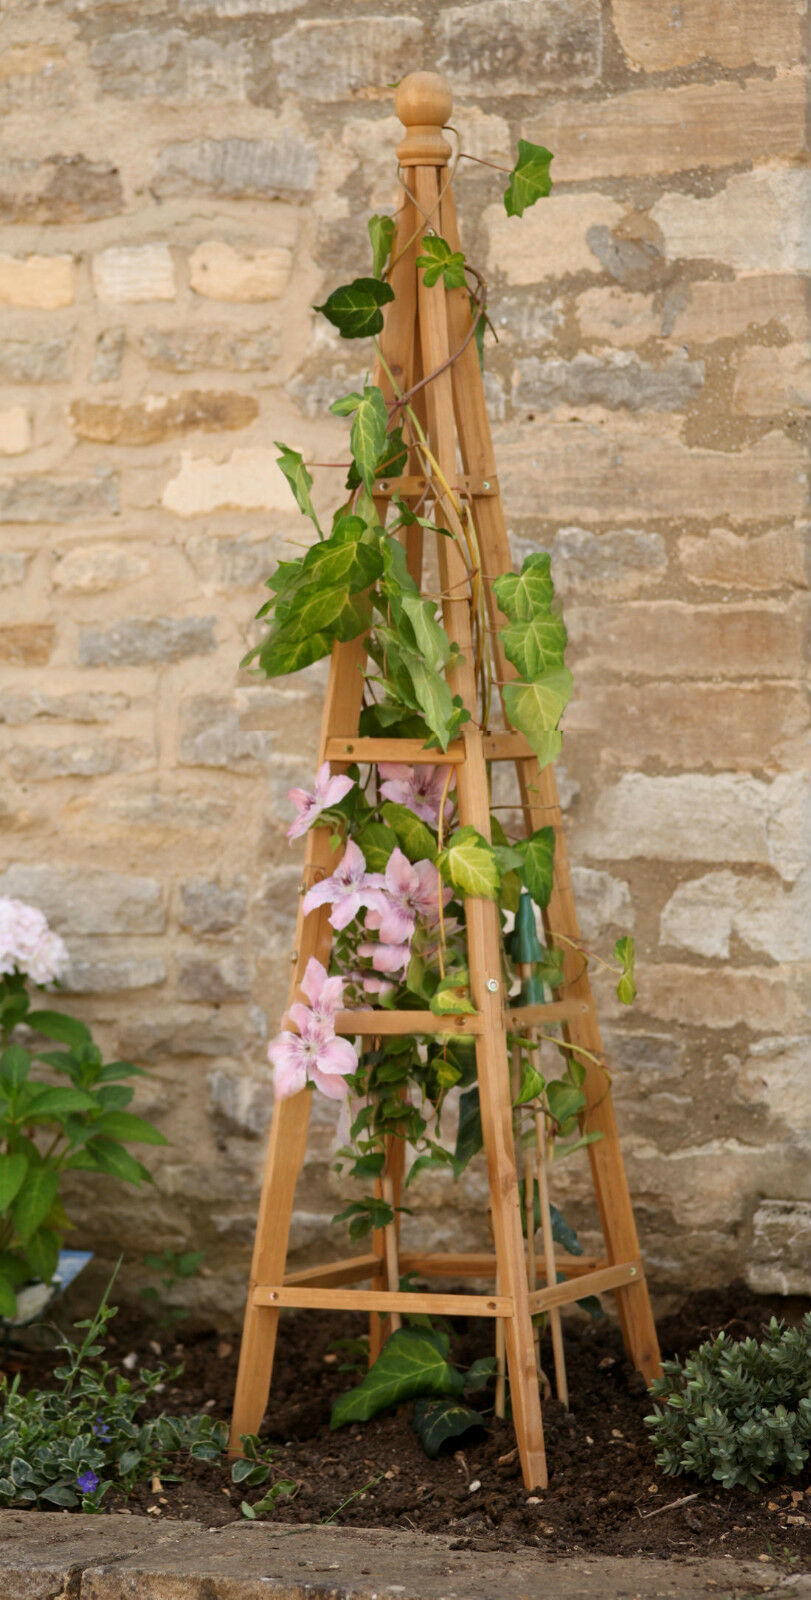 1.5m Selections GFH800 Wooden Garden Obelisk